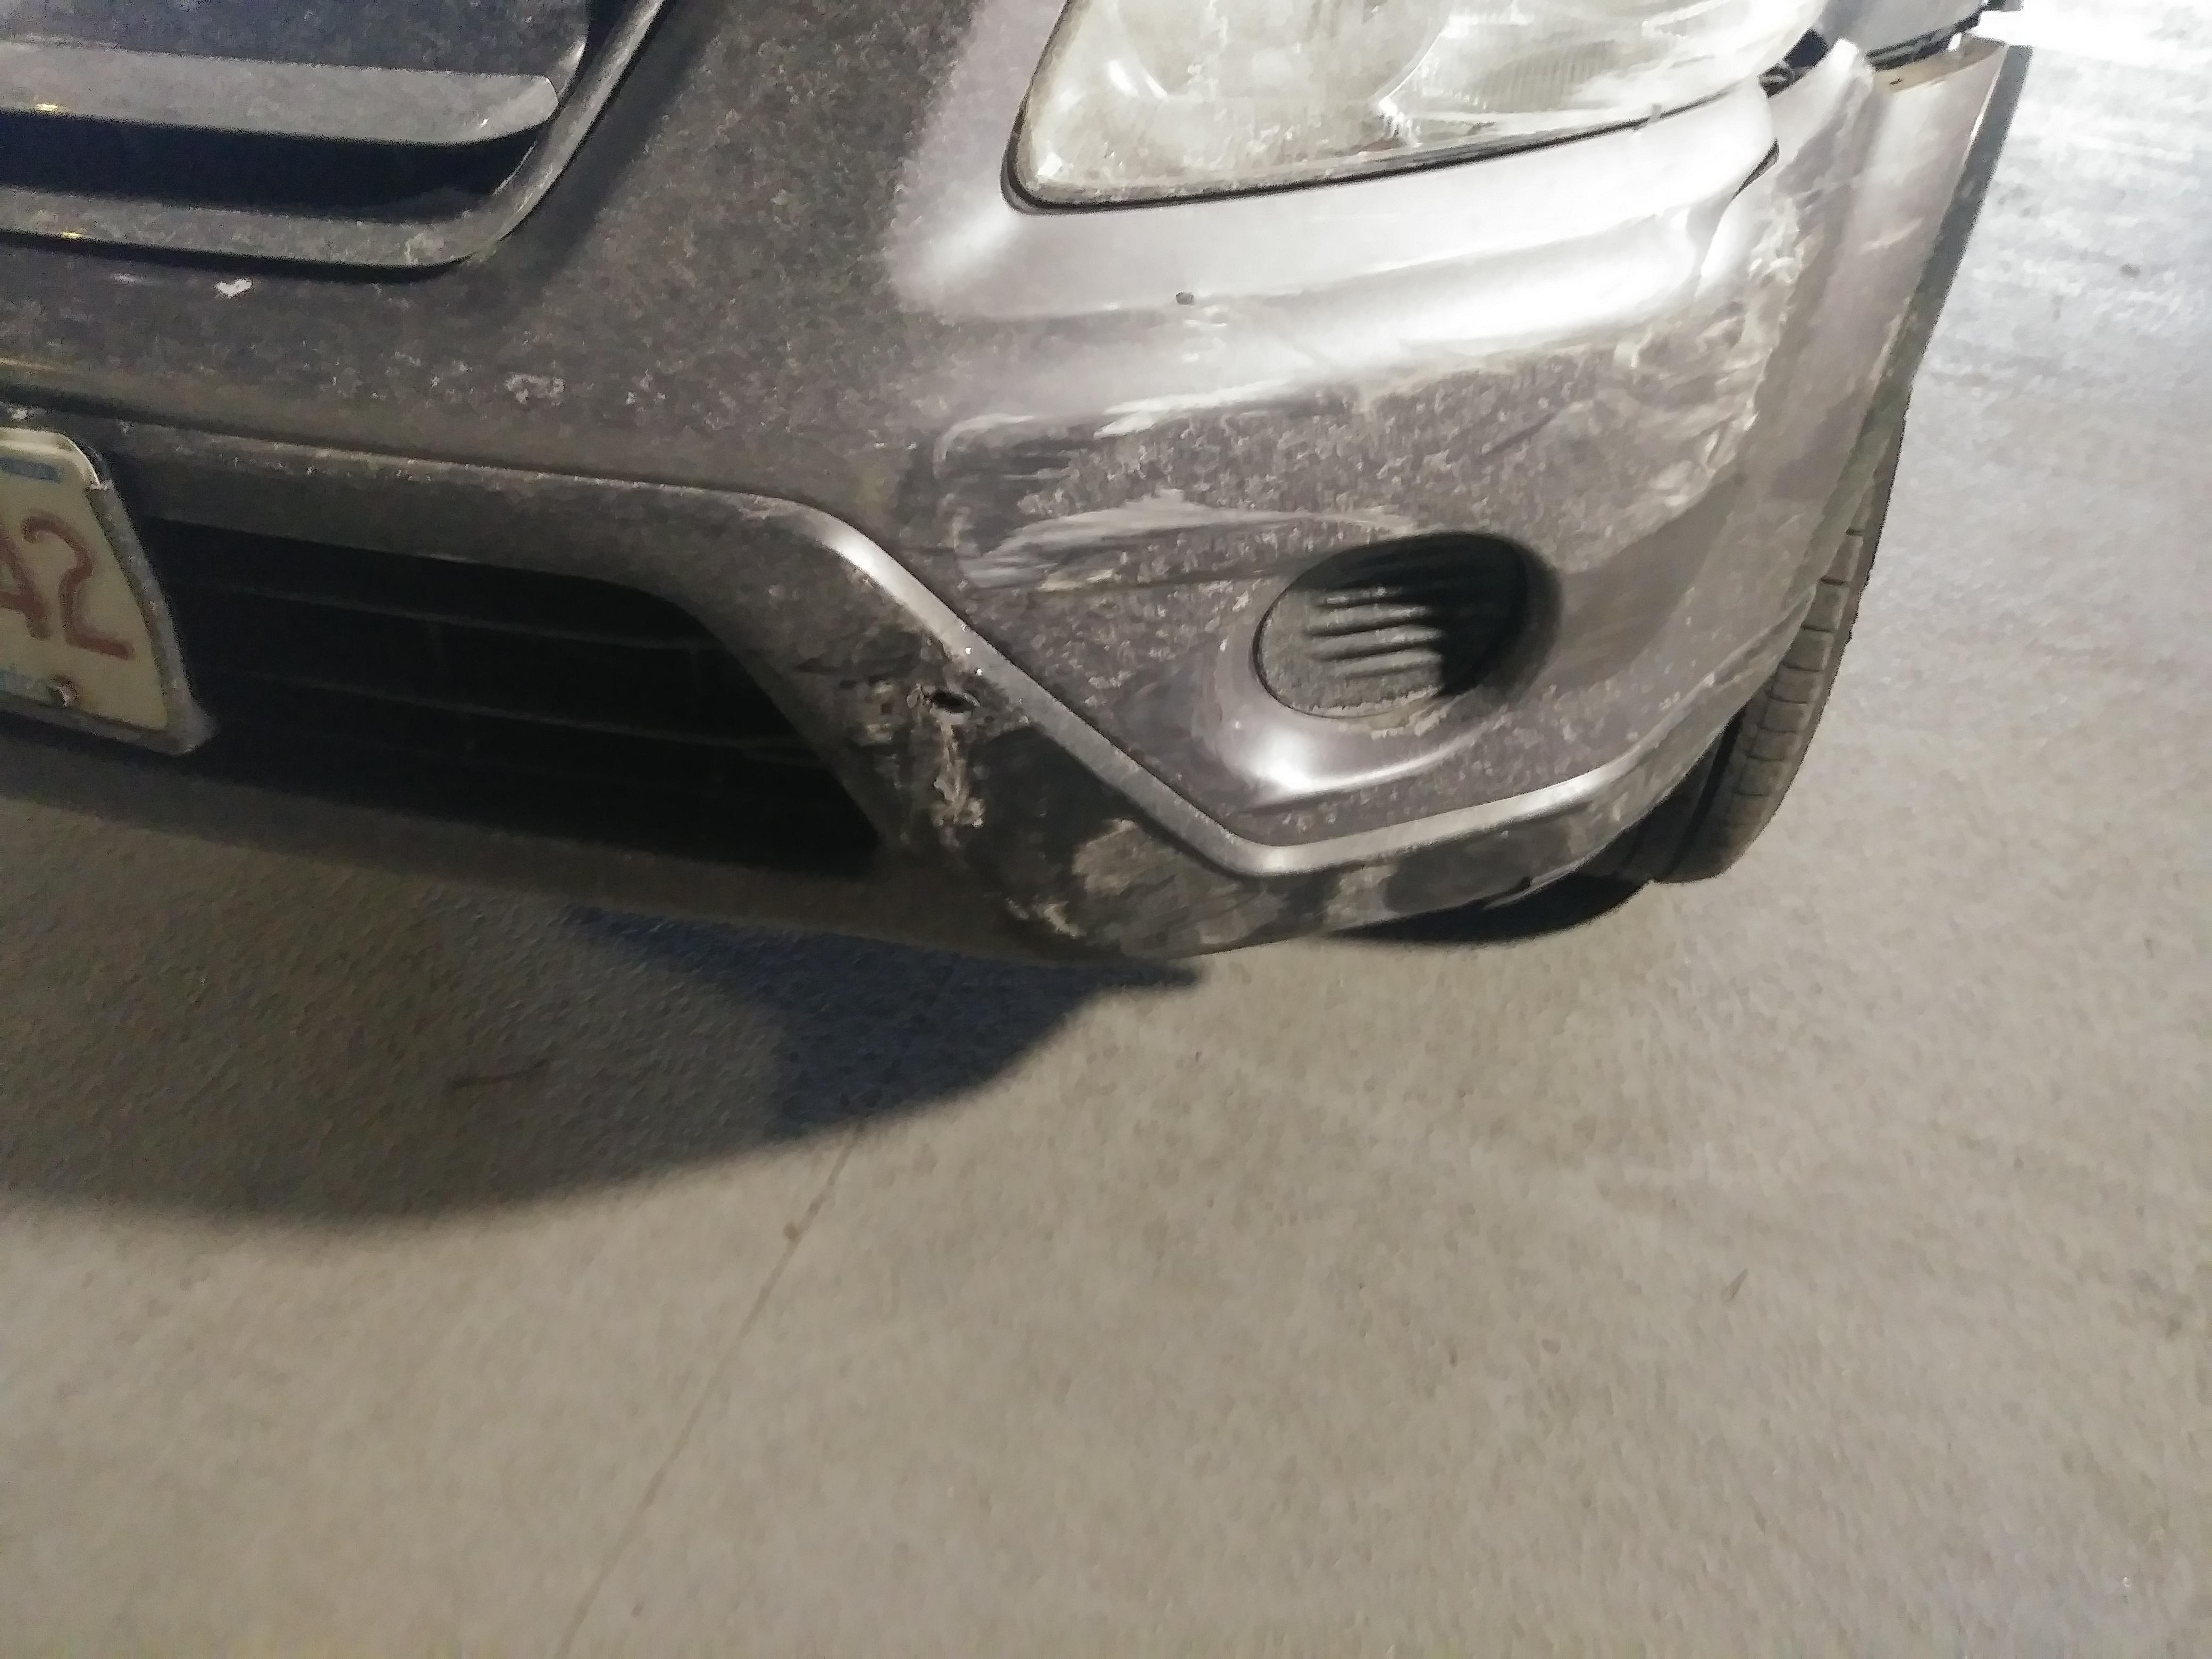 Car accident - No fault?!? Help